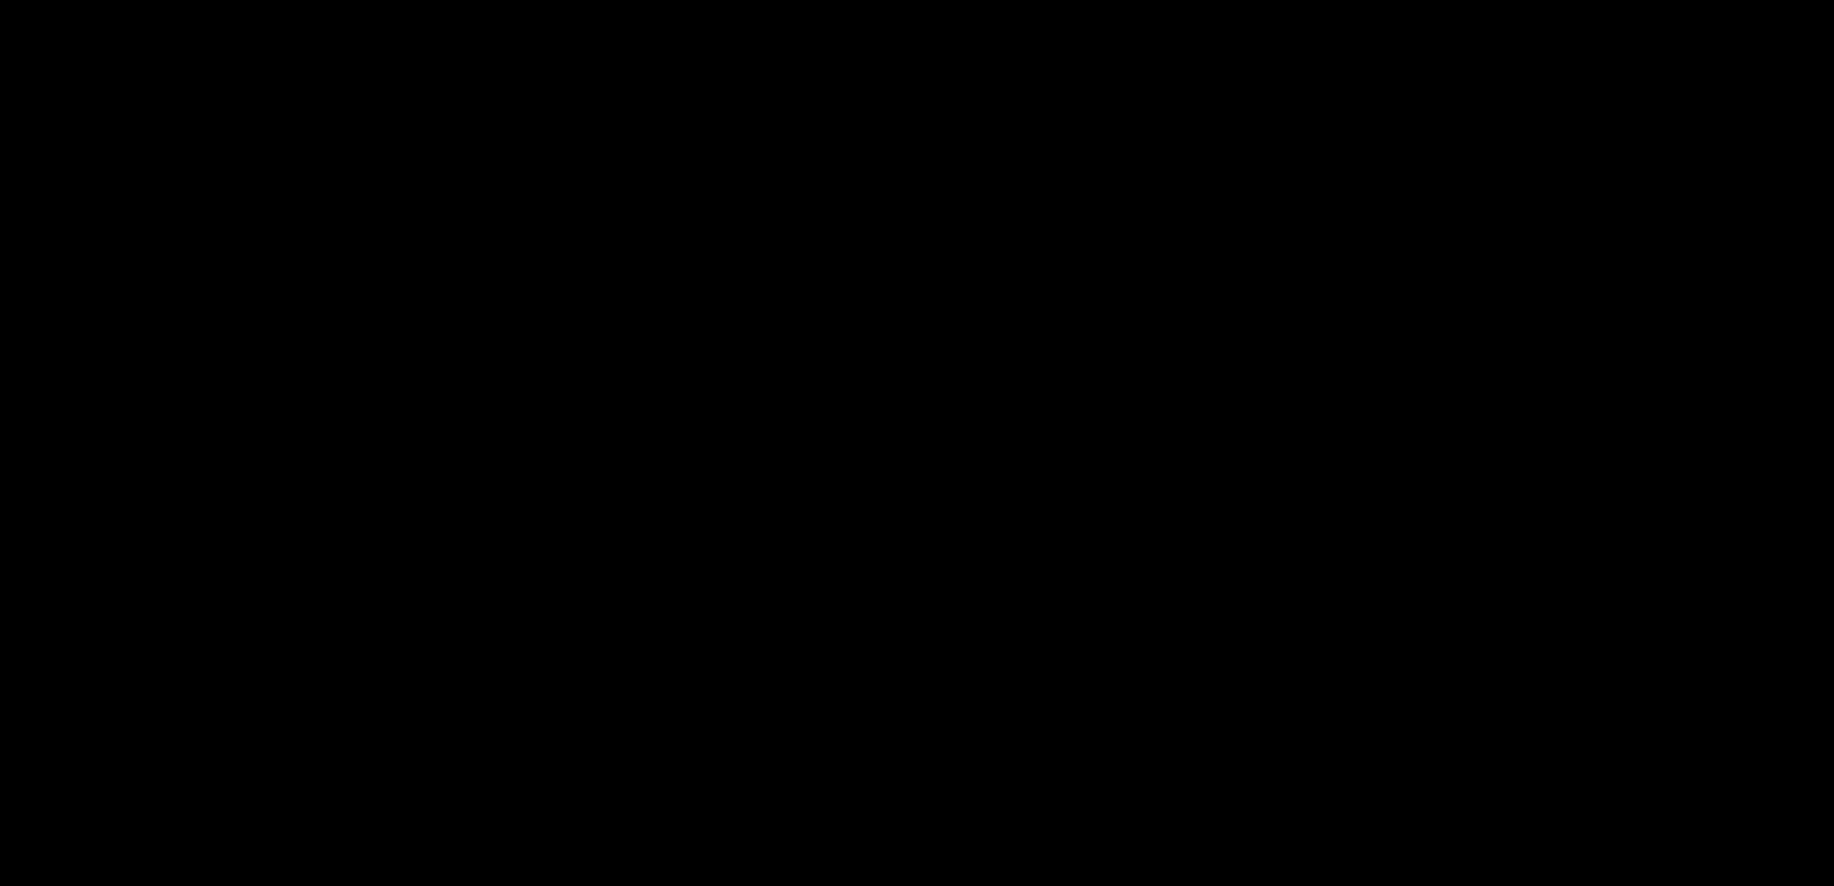 (+)-Biotin 4-nitrophenyl ester